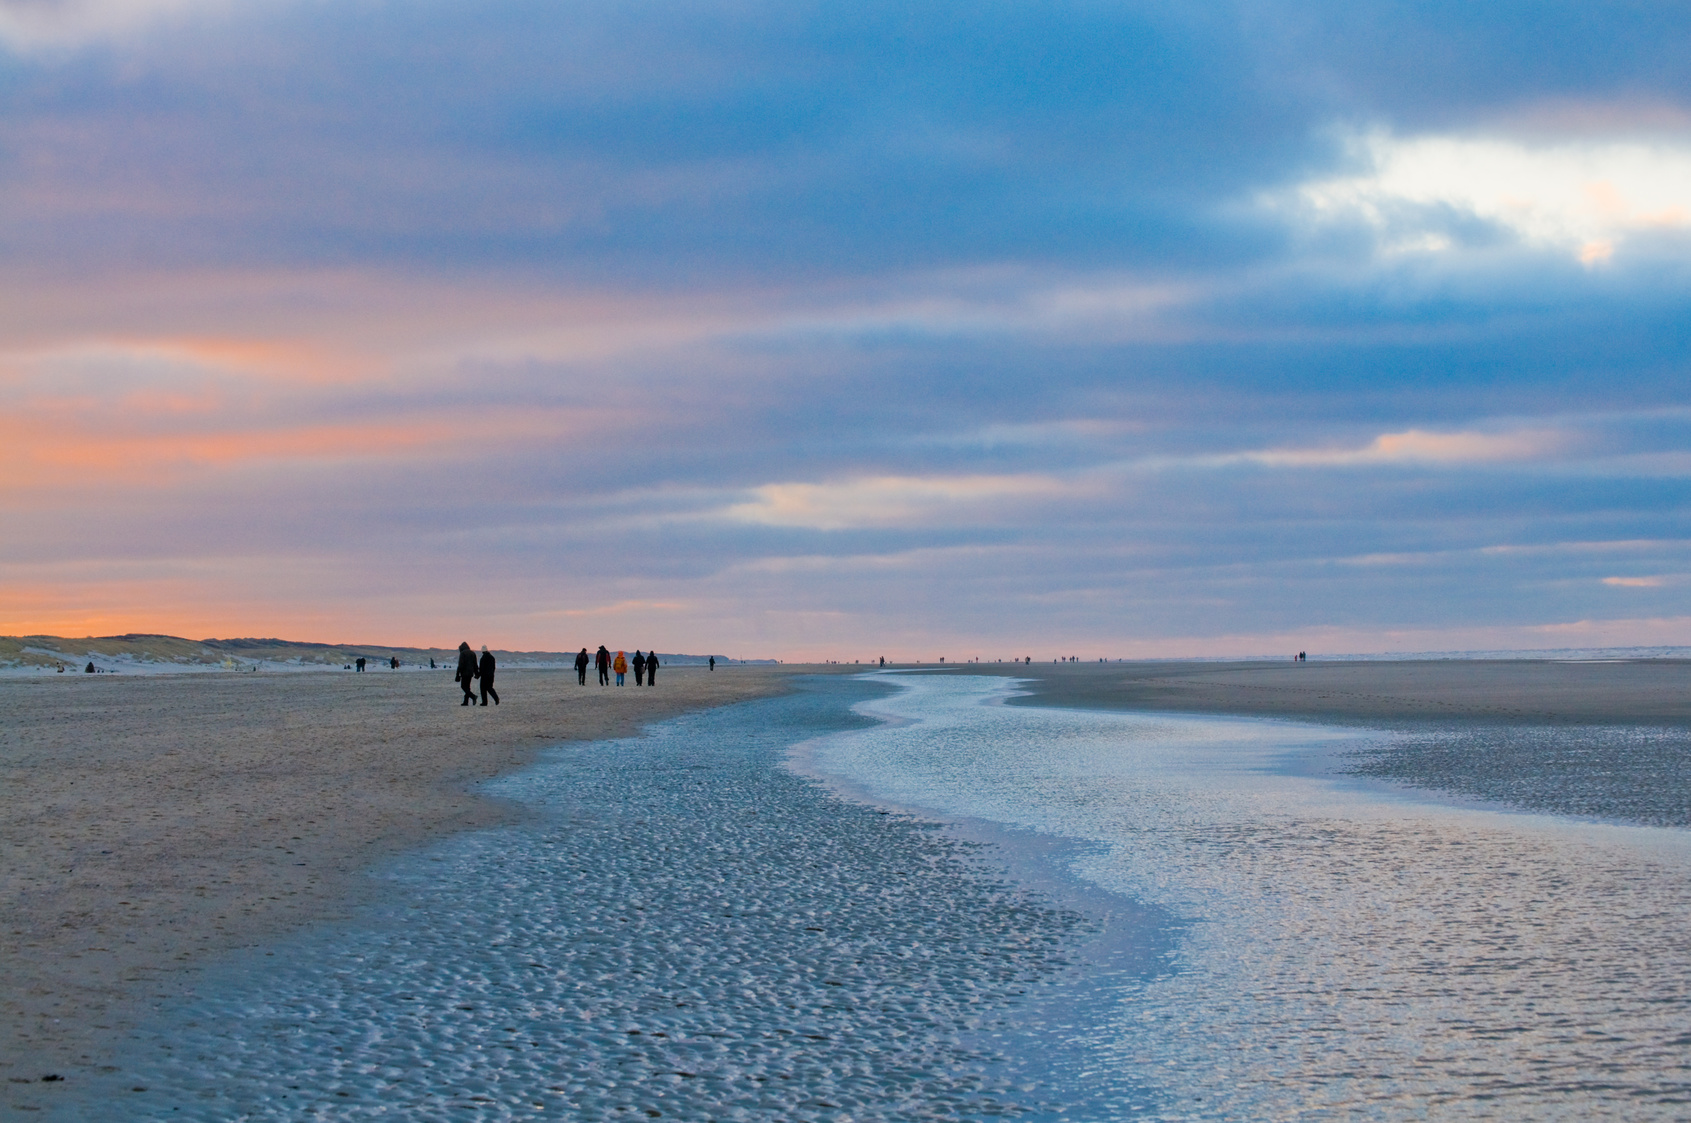 Strandspaziergang, Nordsee, Juist, Ebbe